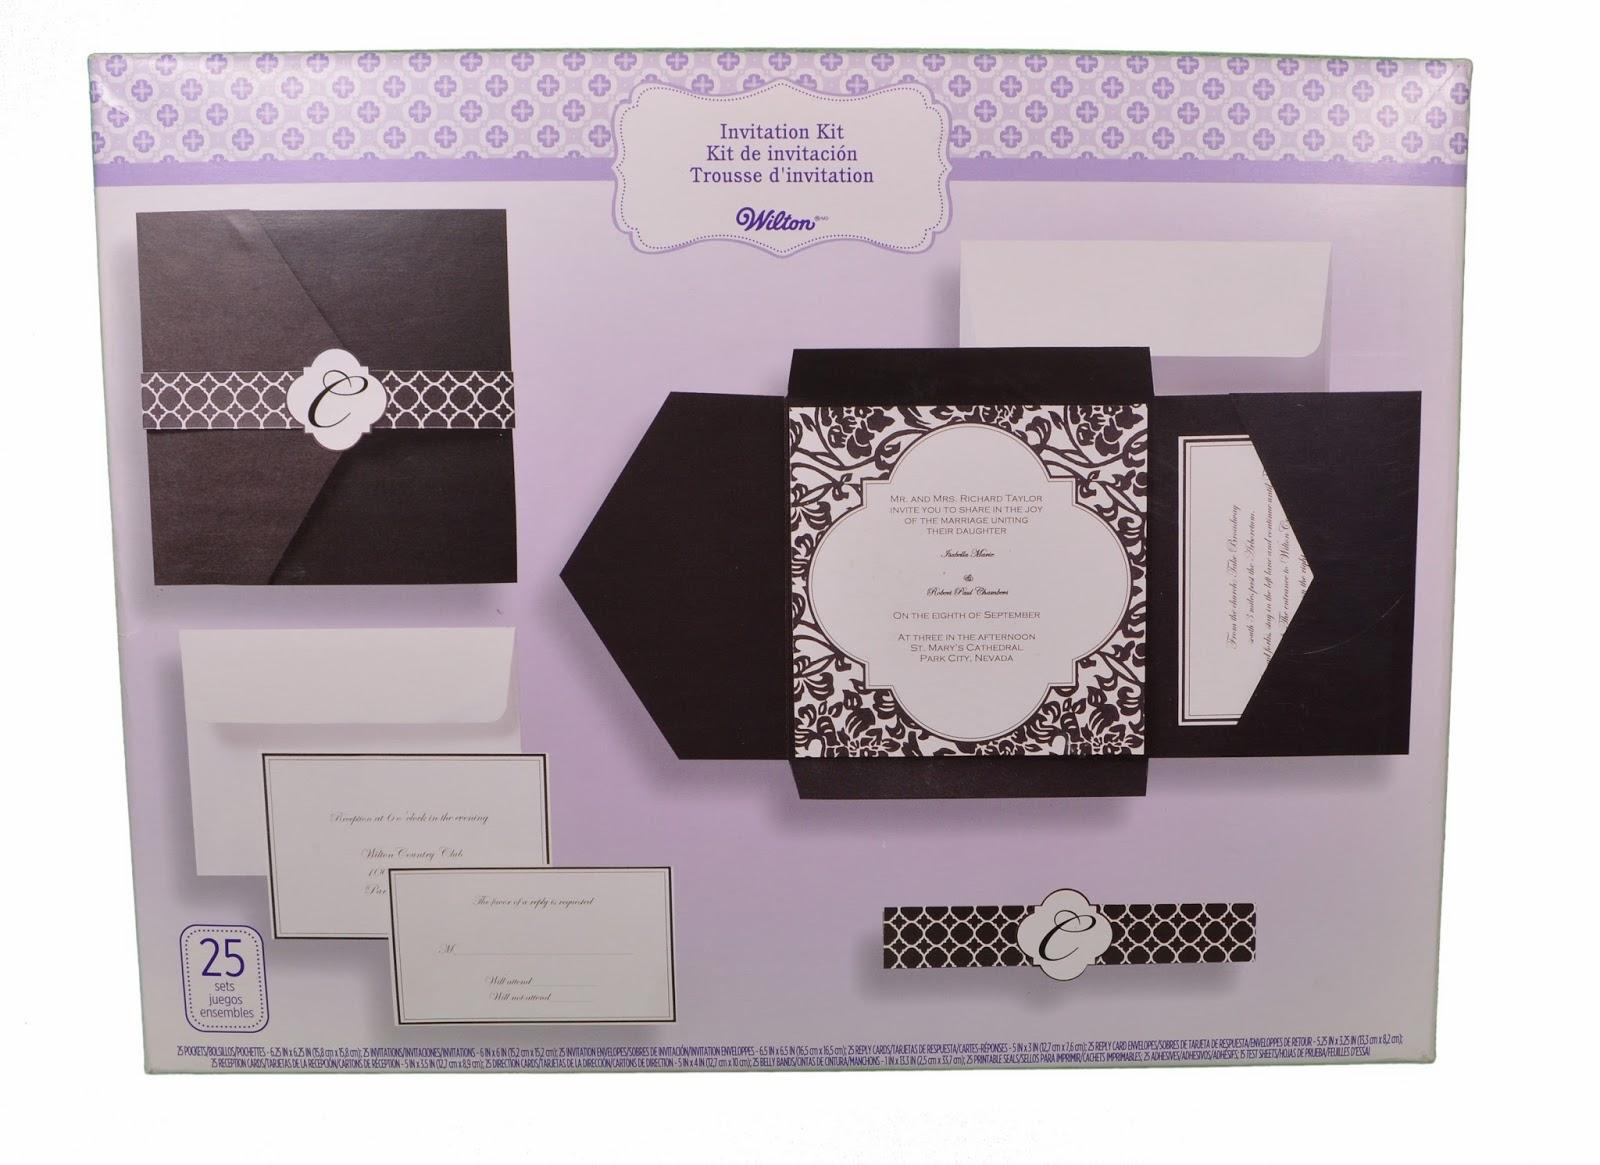 Free Download Making Homemade Wedding Invitation Kits Saves